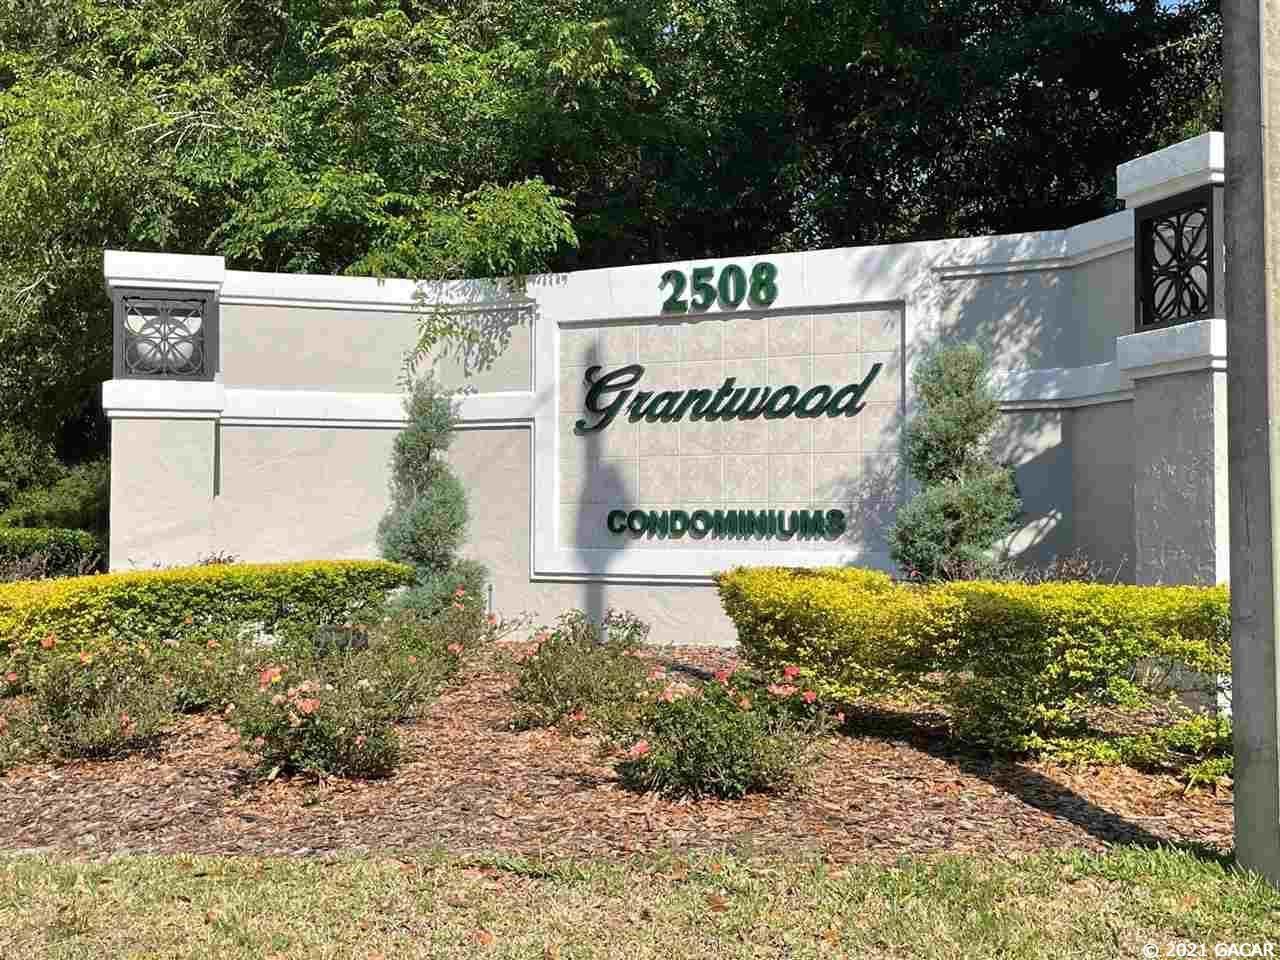 2508 SW 35 Place, Gainesville, FL 32608 - #: 444727